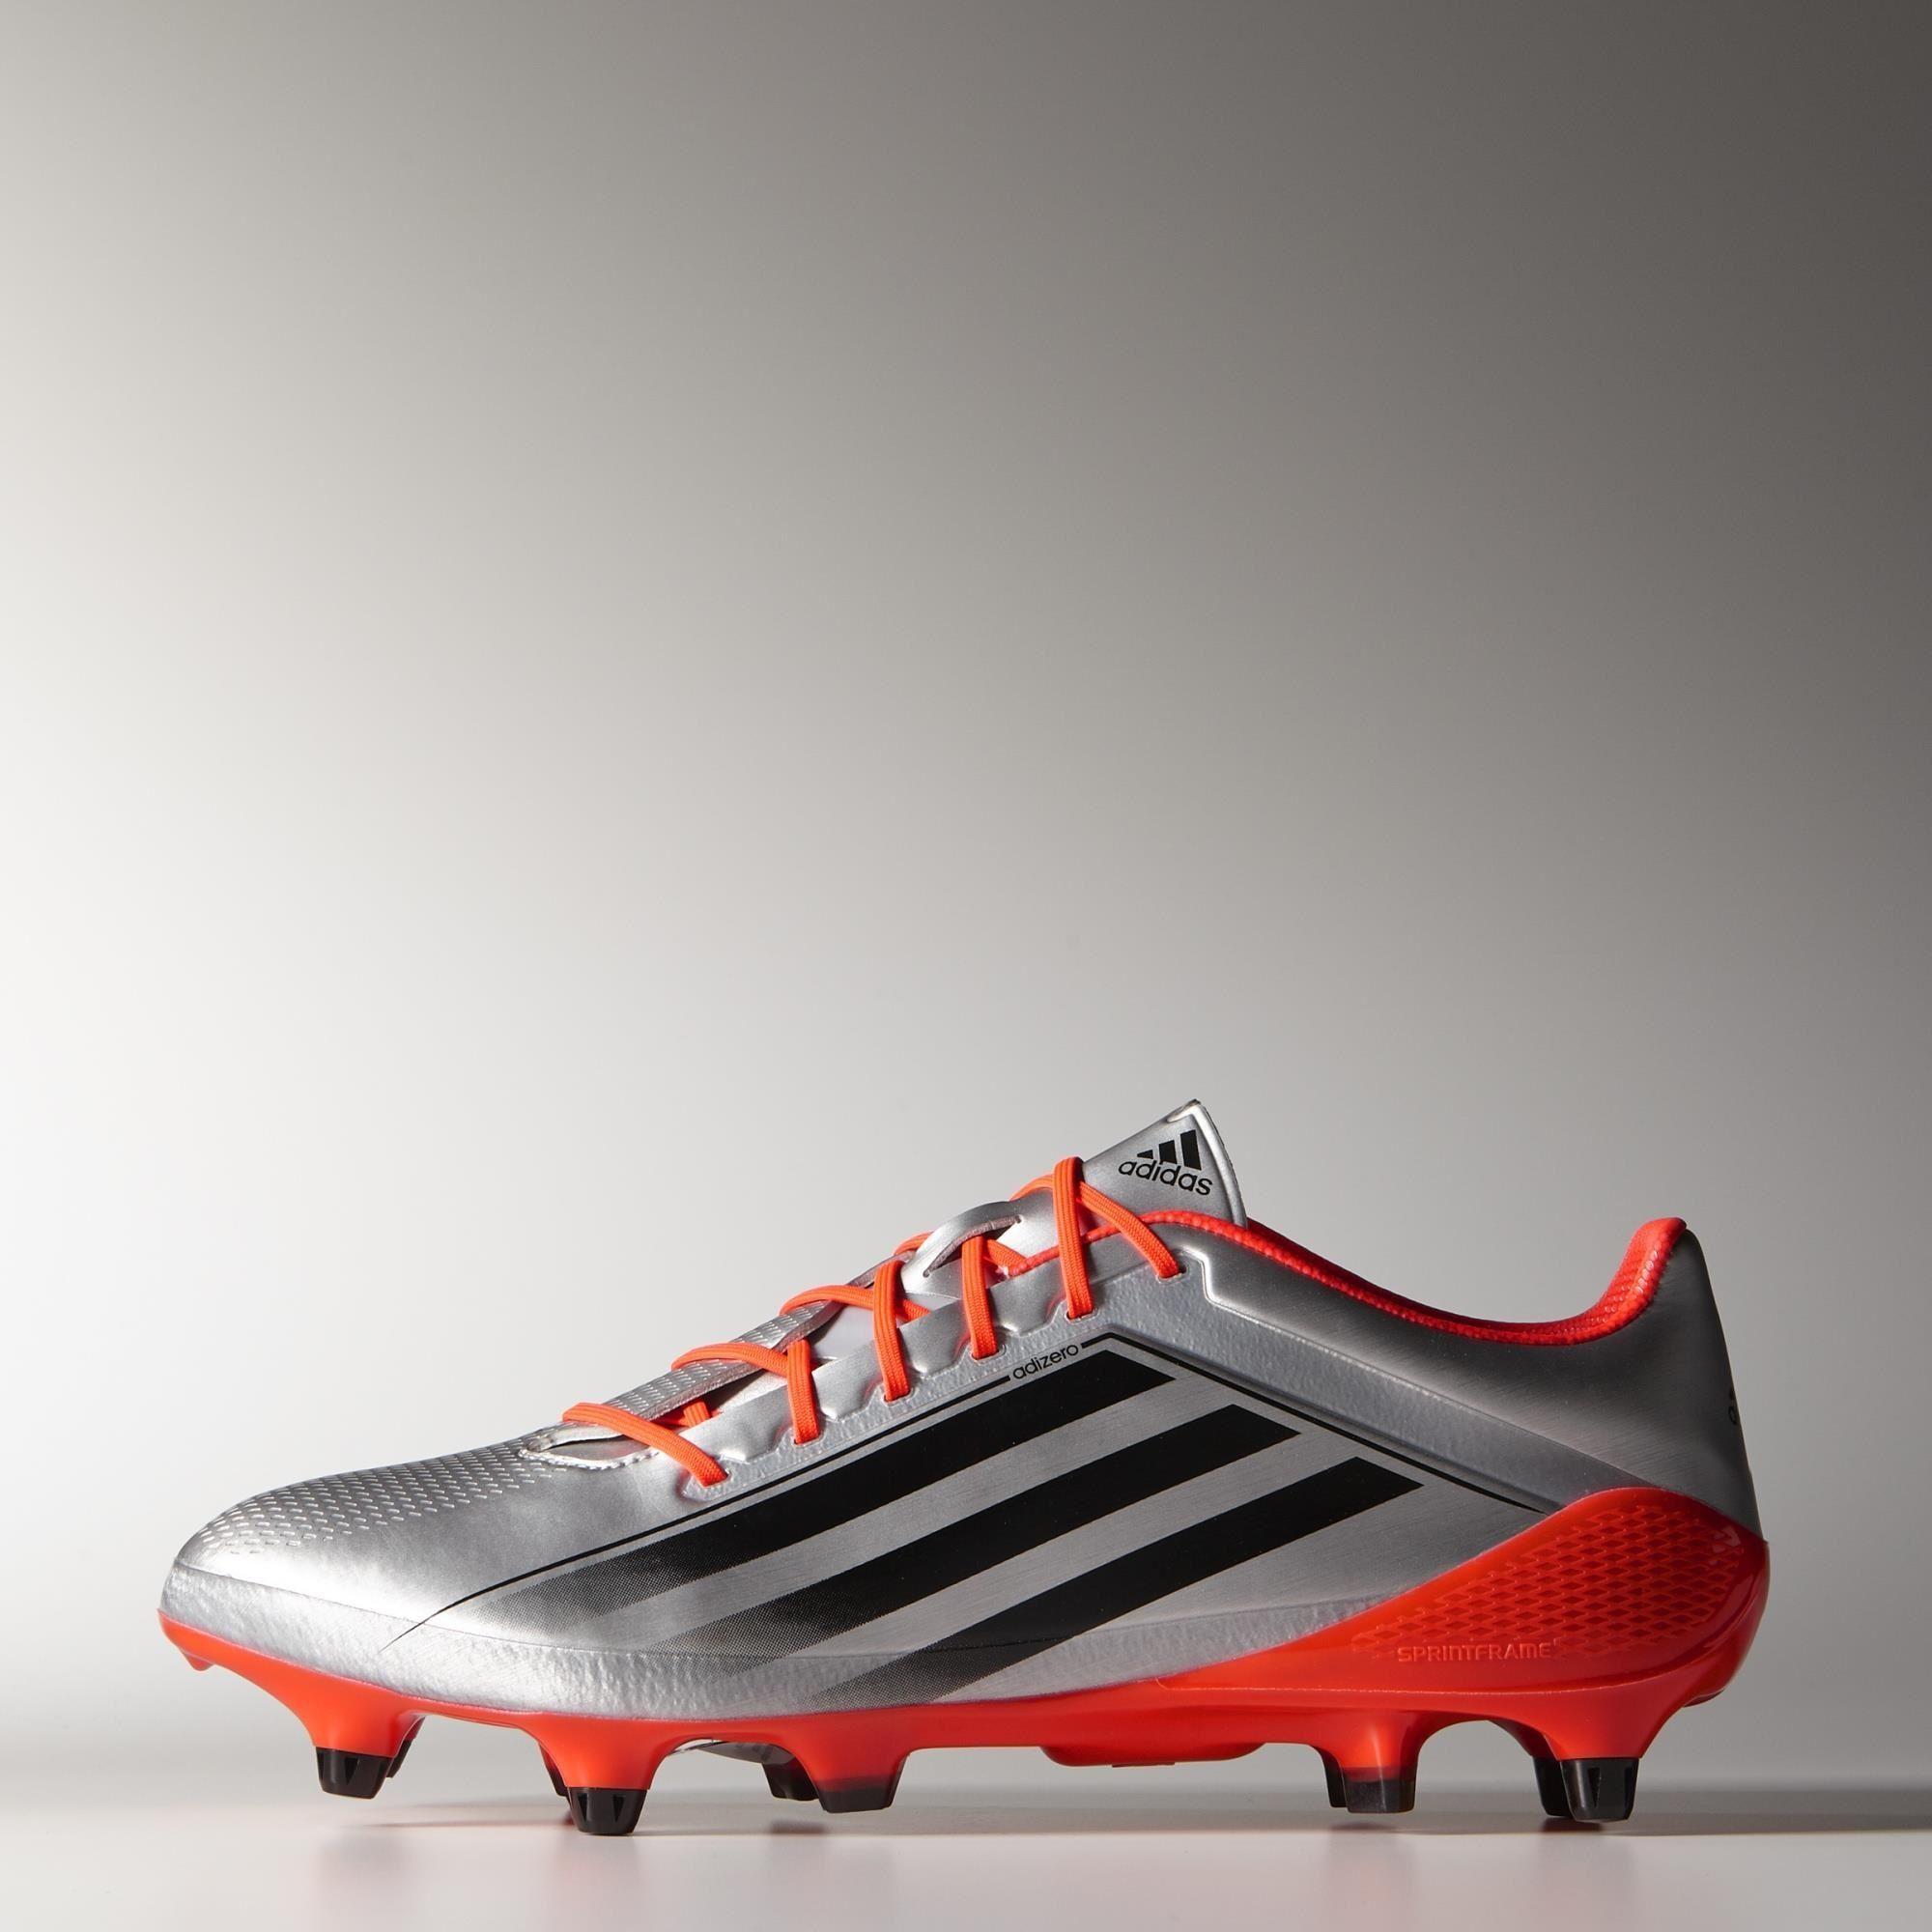 adidas boots new zealand